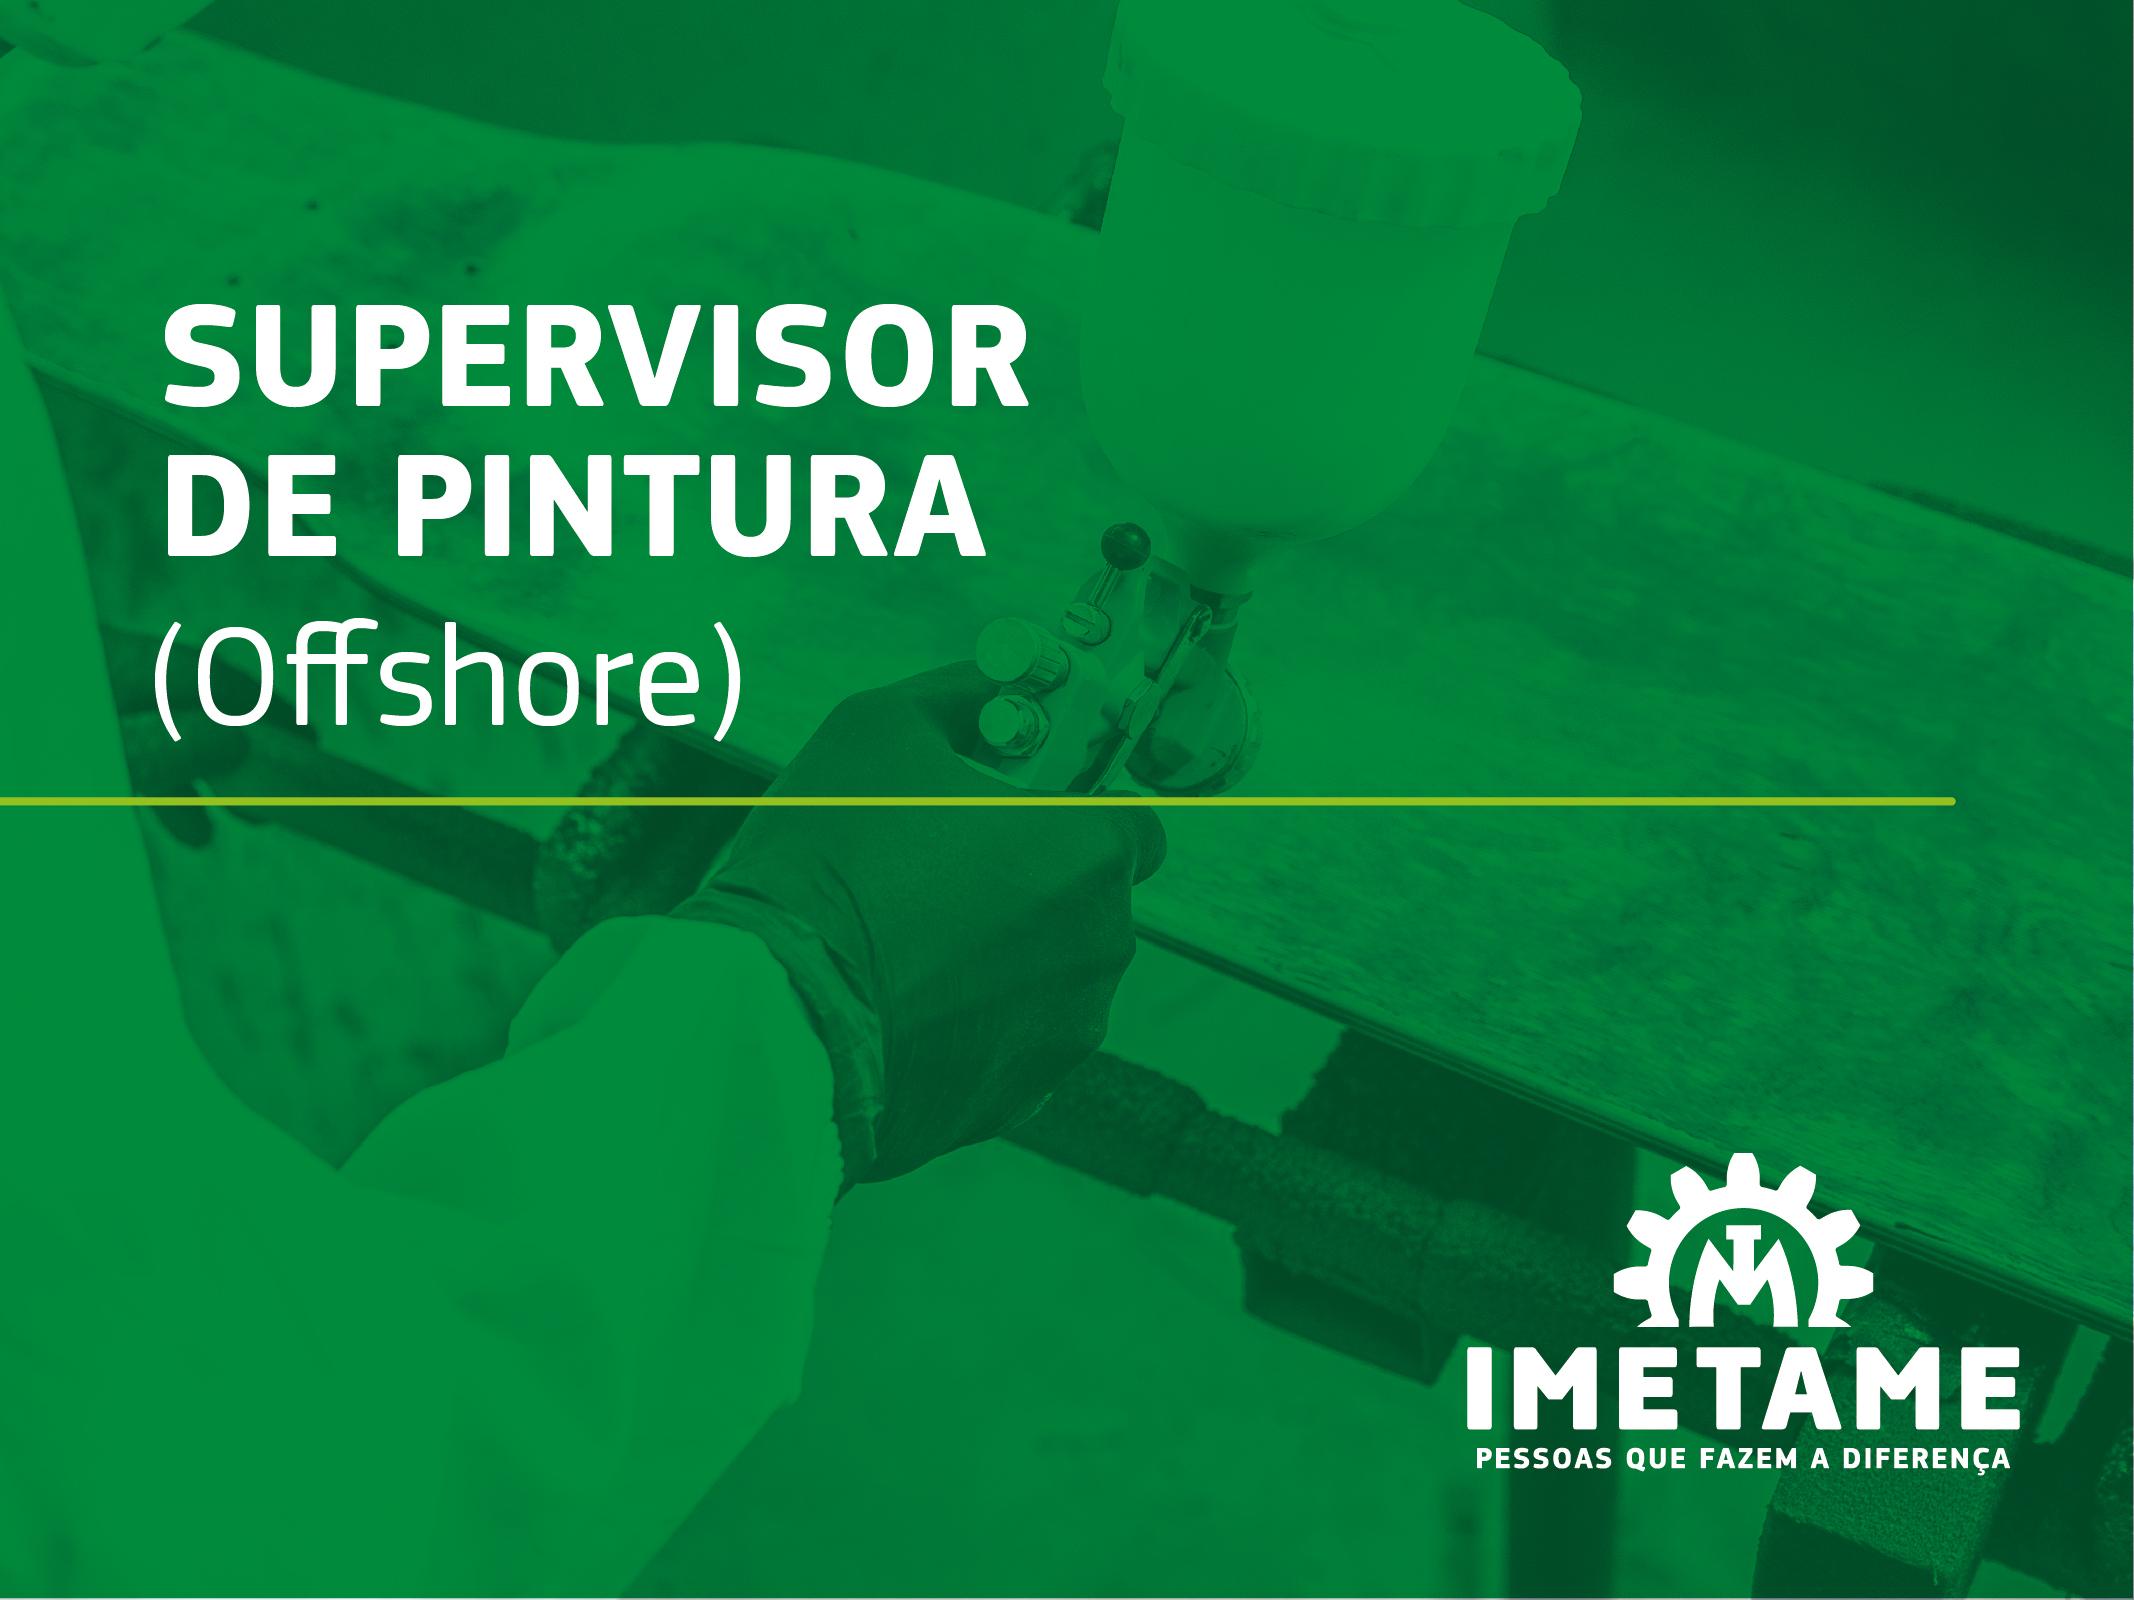 Supervisor de Pintura – Offshore